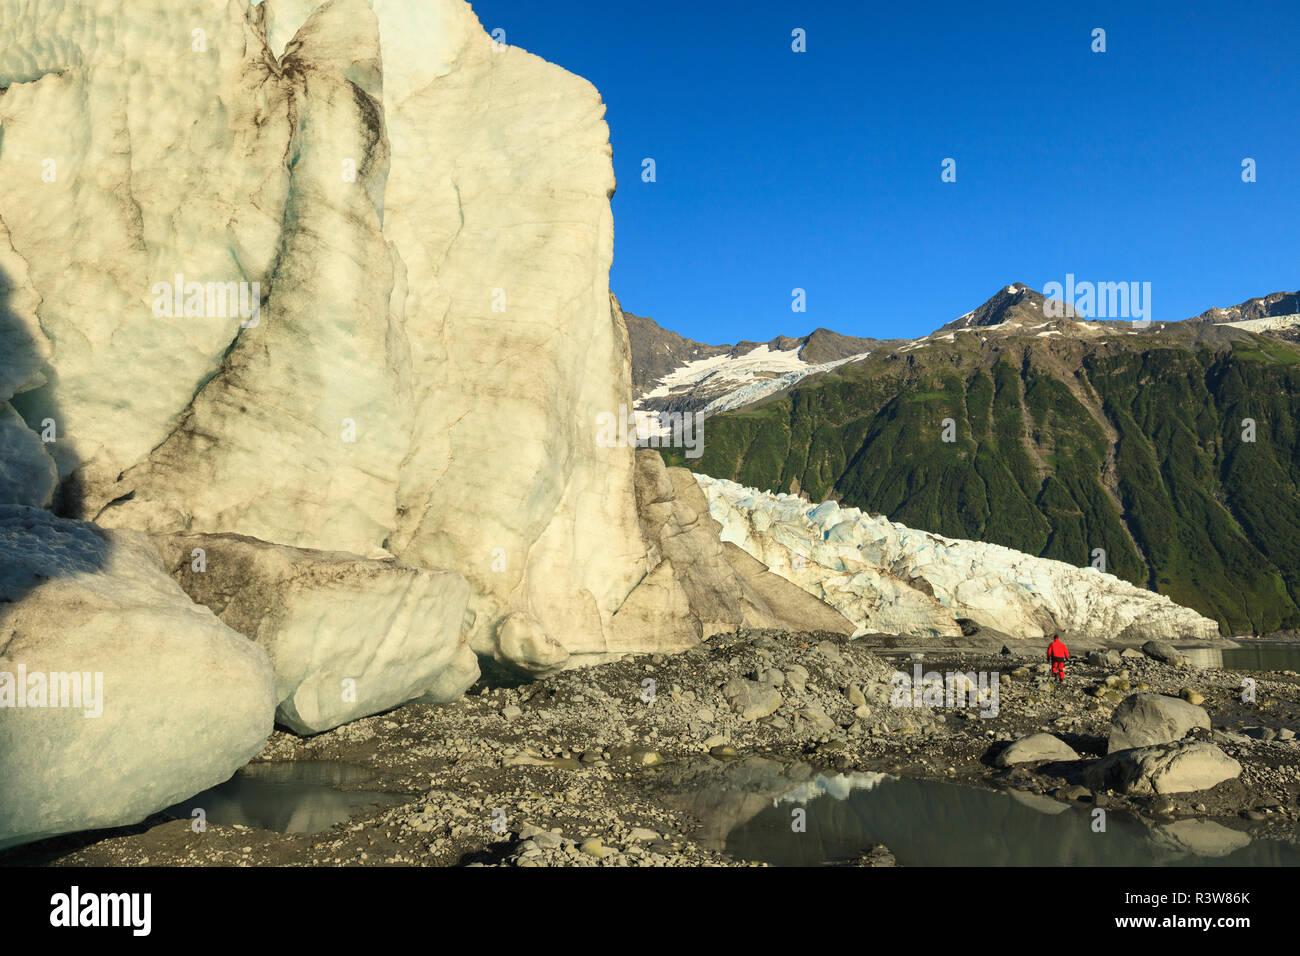 Ecotourist, Harriman Fjord, Chugach Mountains, Chugach National Forest, Prince William Sound, Alaska (MR) - Stock Image